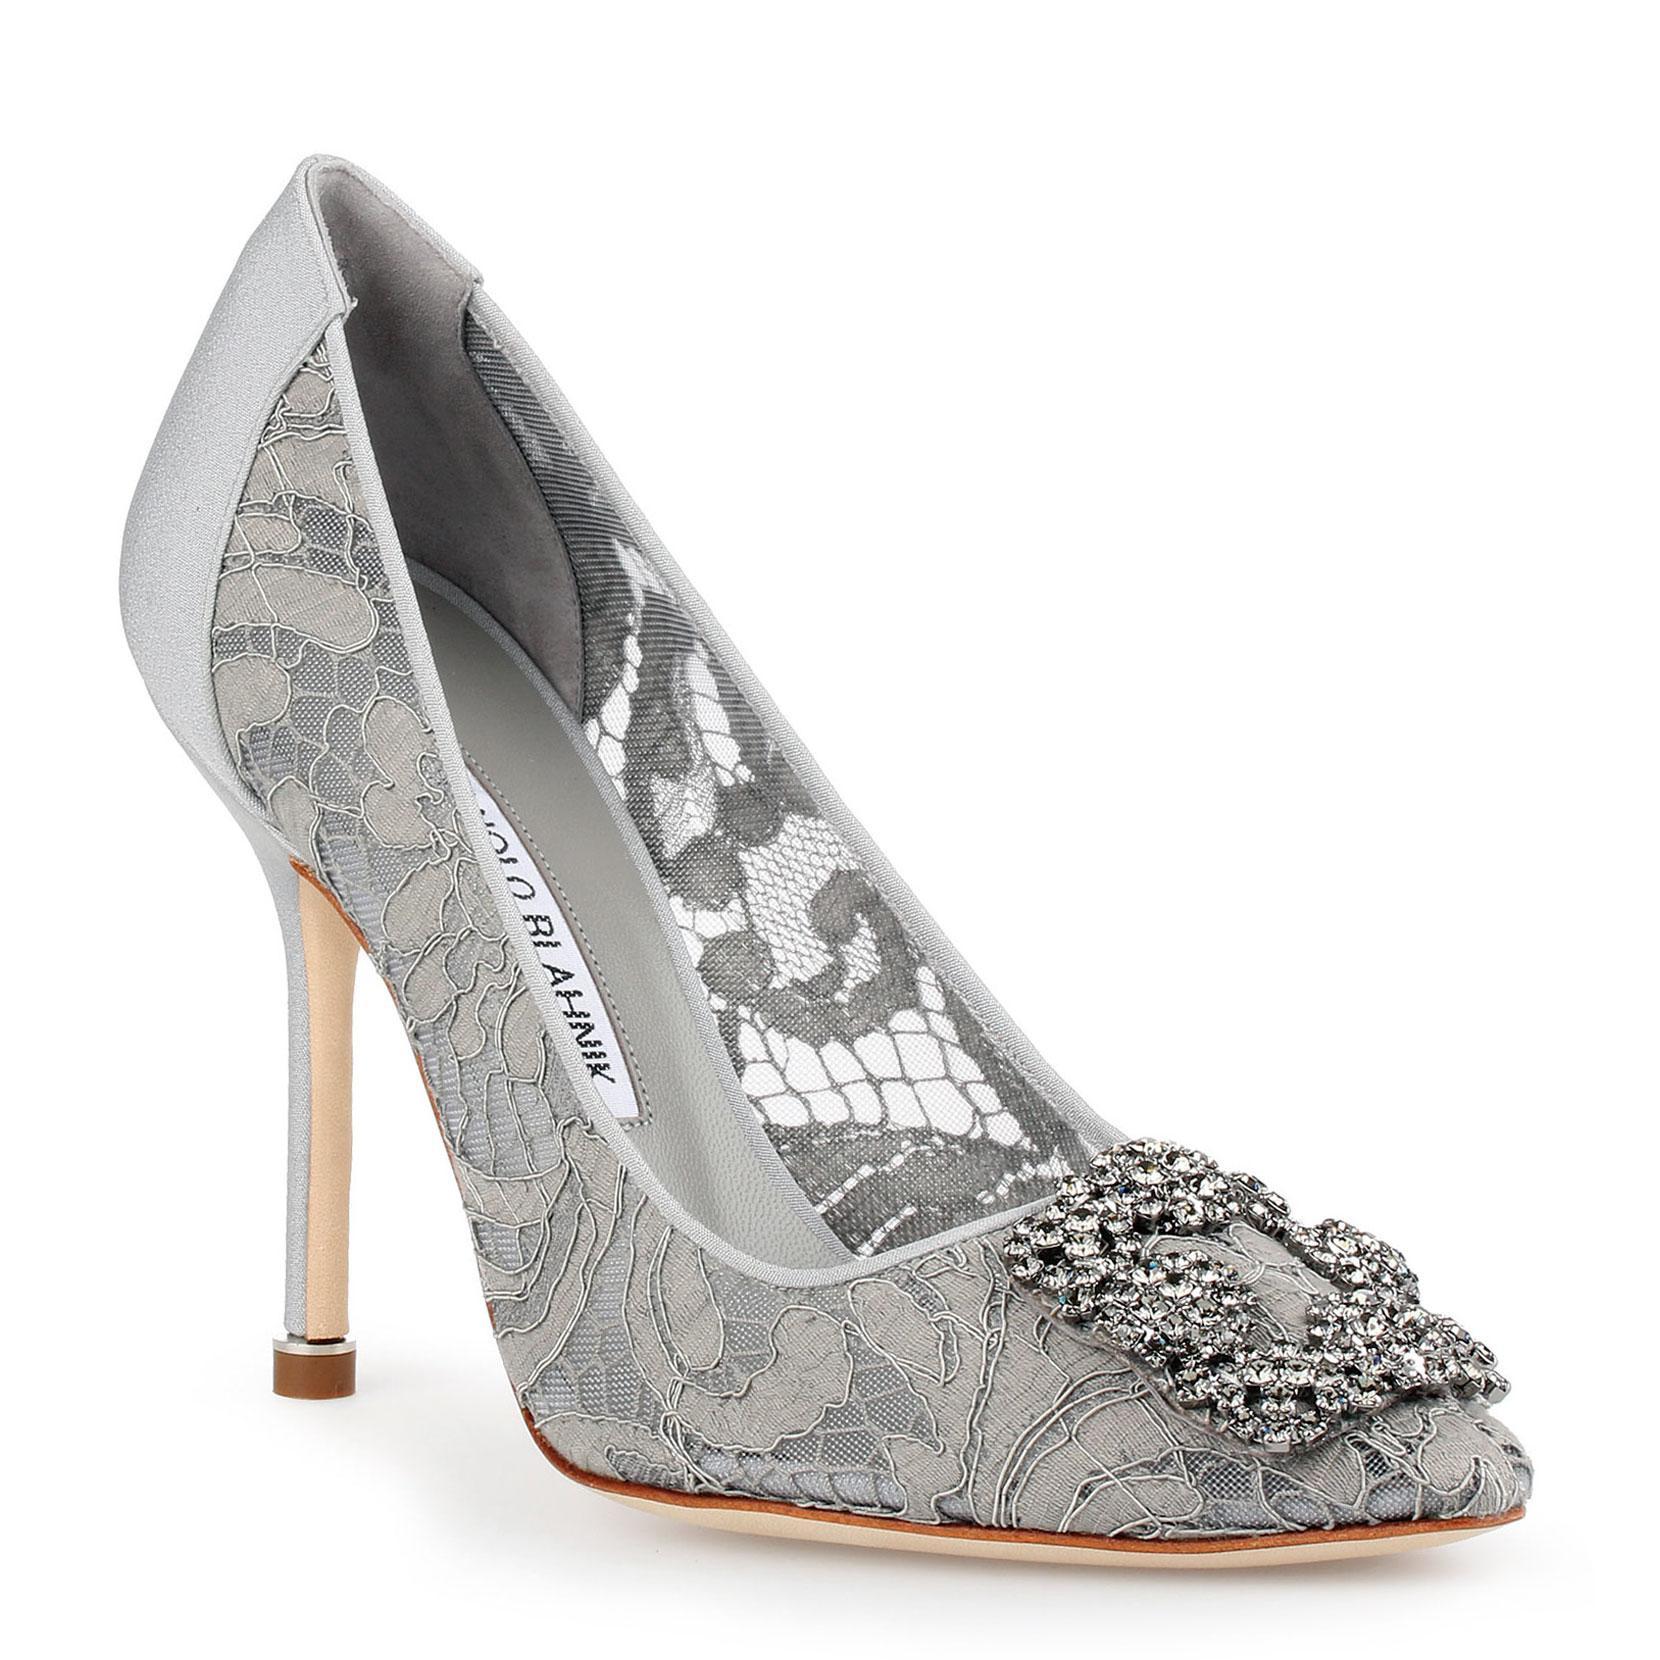 Hangisi 105 grey lace pump Manolo Blahnik A7jZT